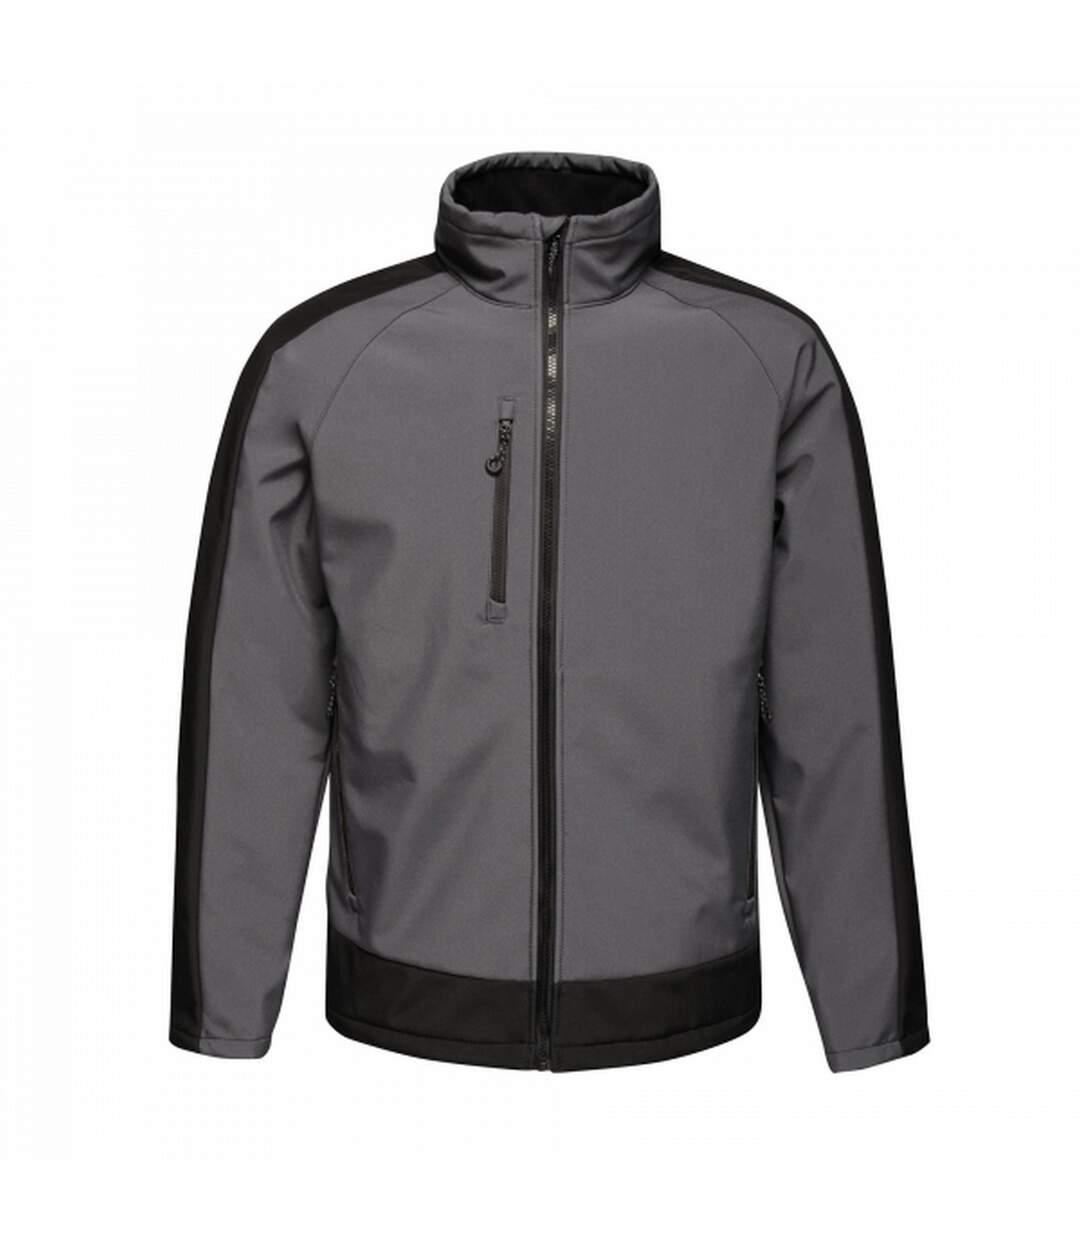 Regatta Mens Contrast 3 Layer Softshell Full Zip Jacket (Slate Grey/Signal Black) - UTRG3747